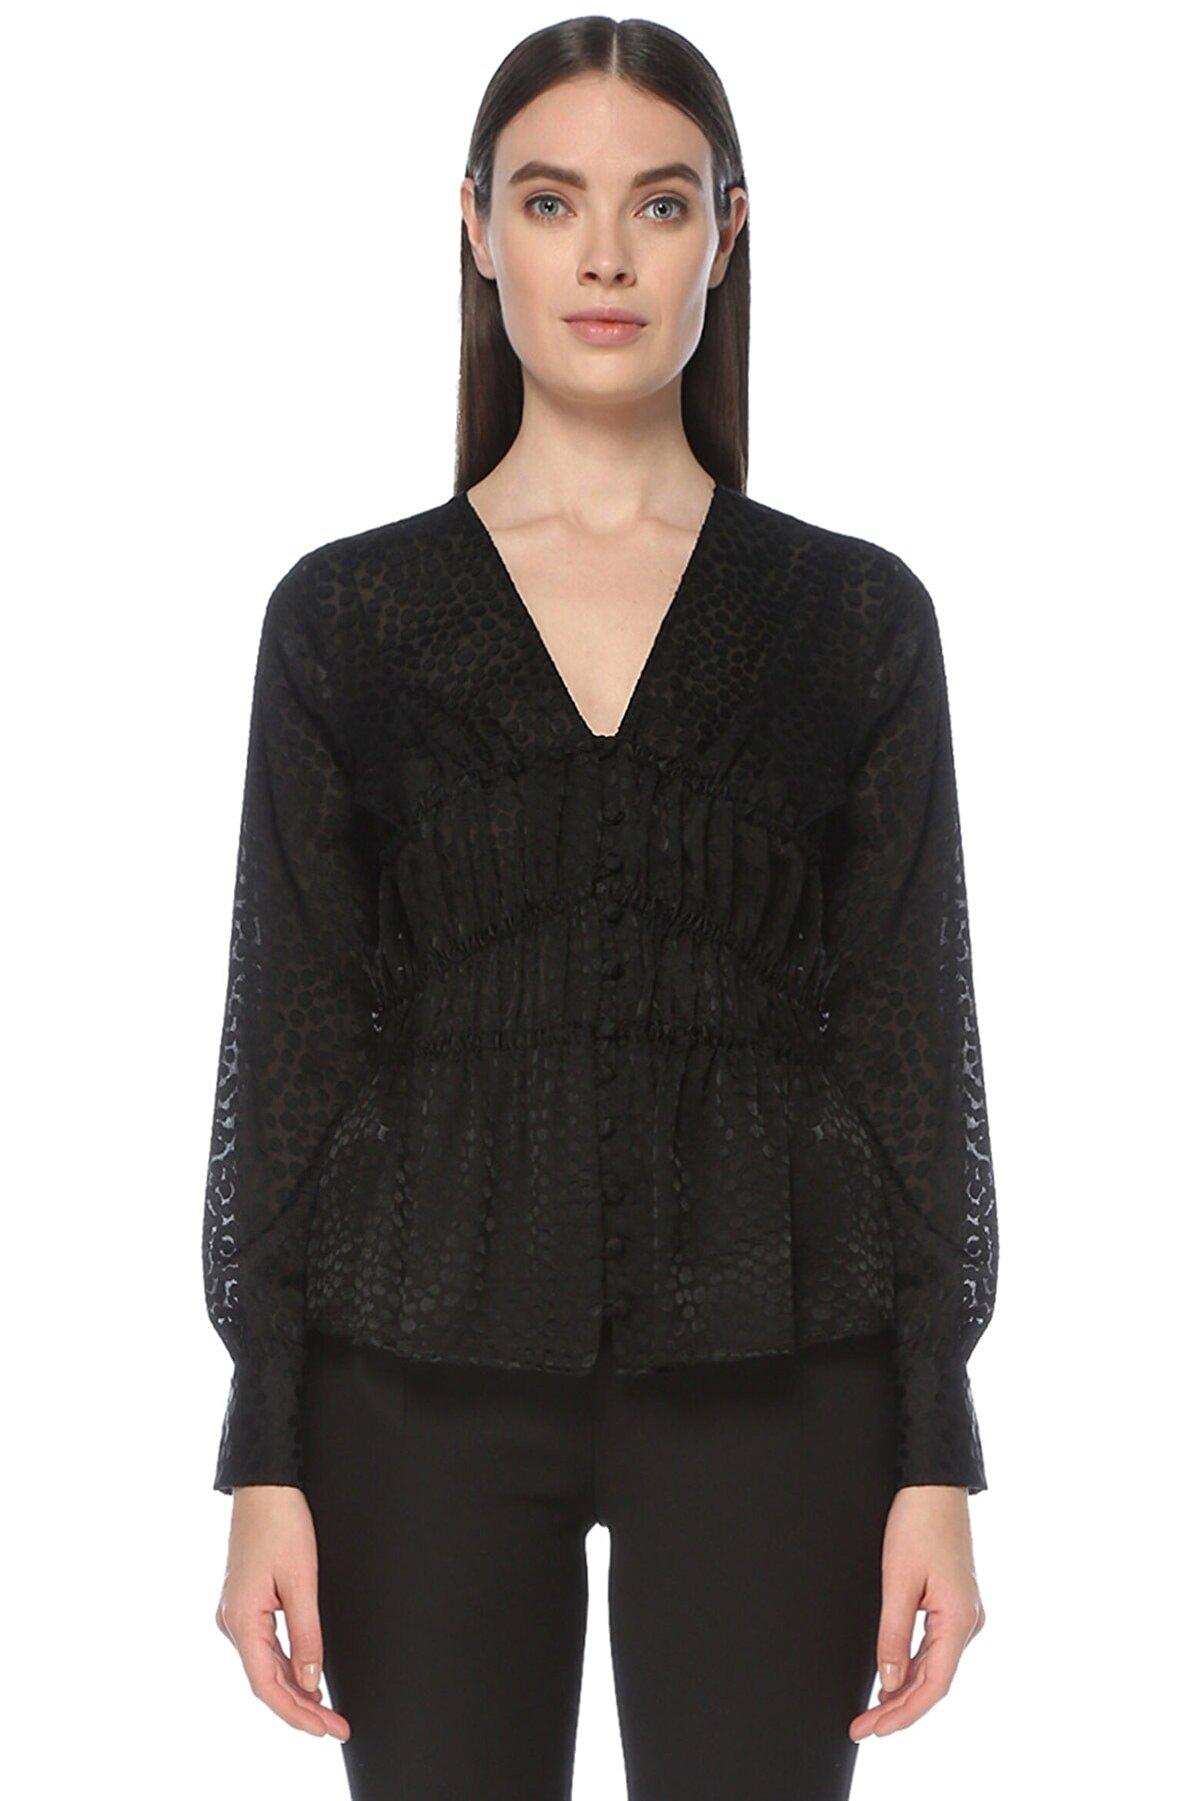 Network Kadın Siyah Siyah V Yaka Desenli Gömlek 1076342